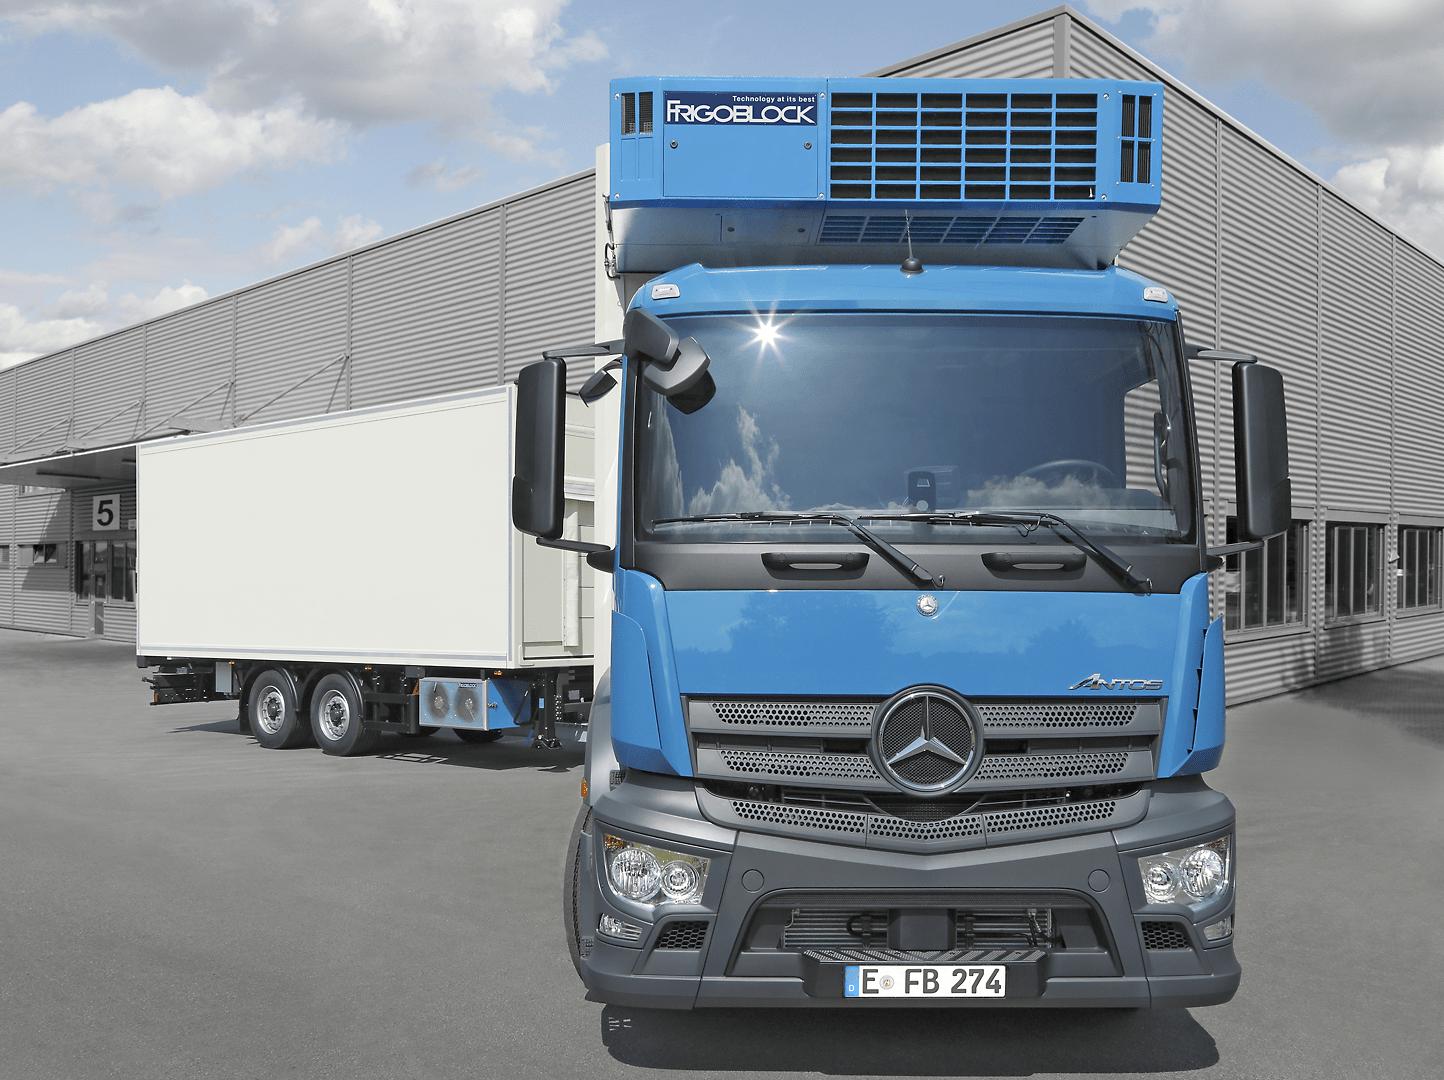 Michael Ward Limited FRIGOBLOCK transport refrigeration unit